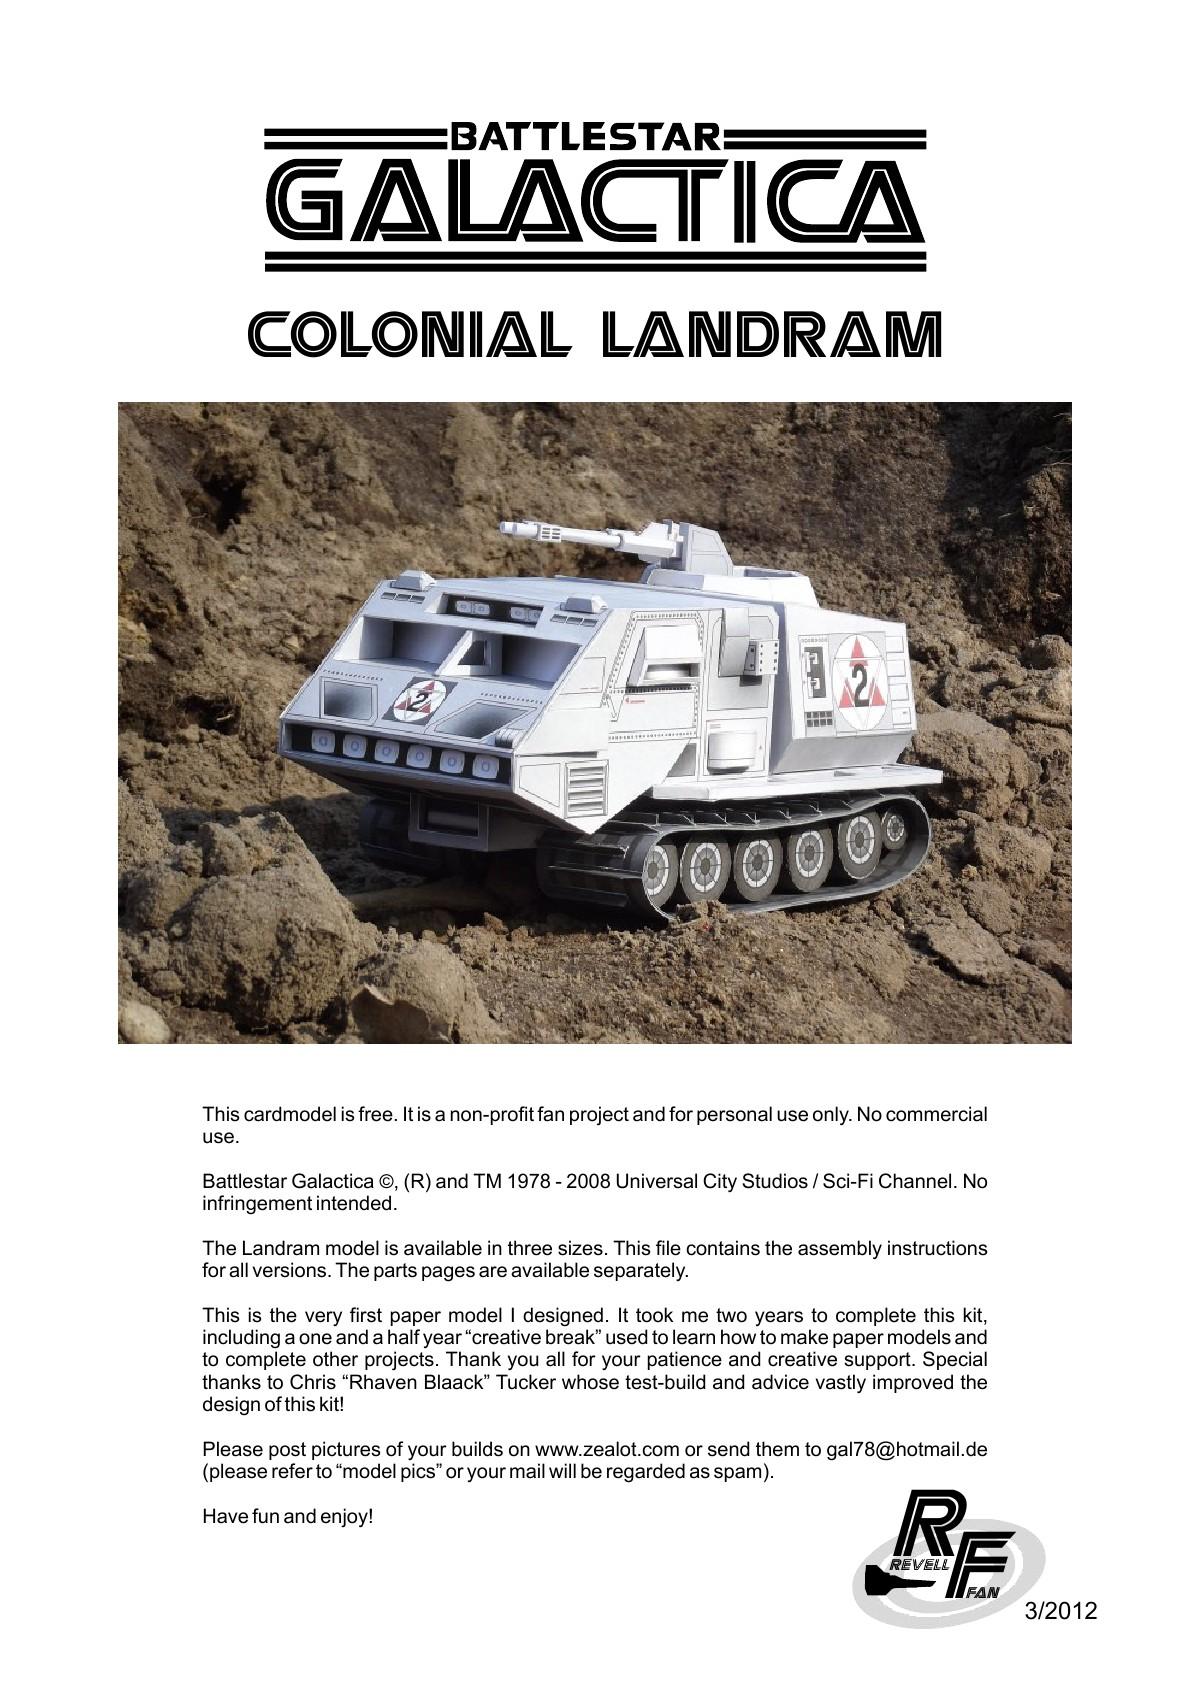 coloniallandram-ai1.jpg